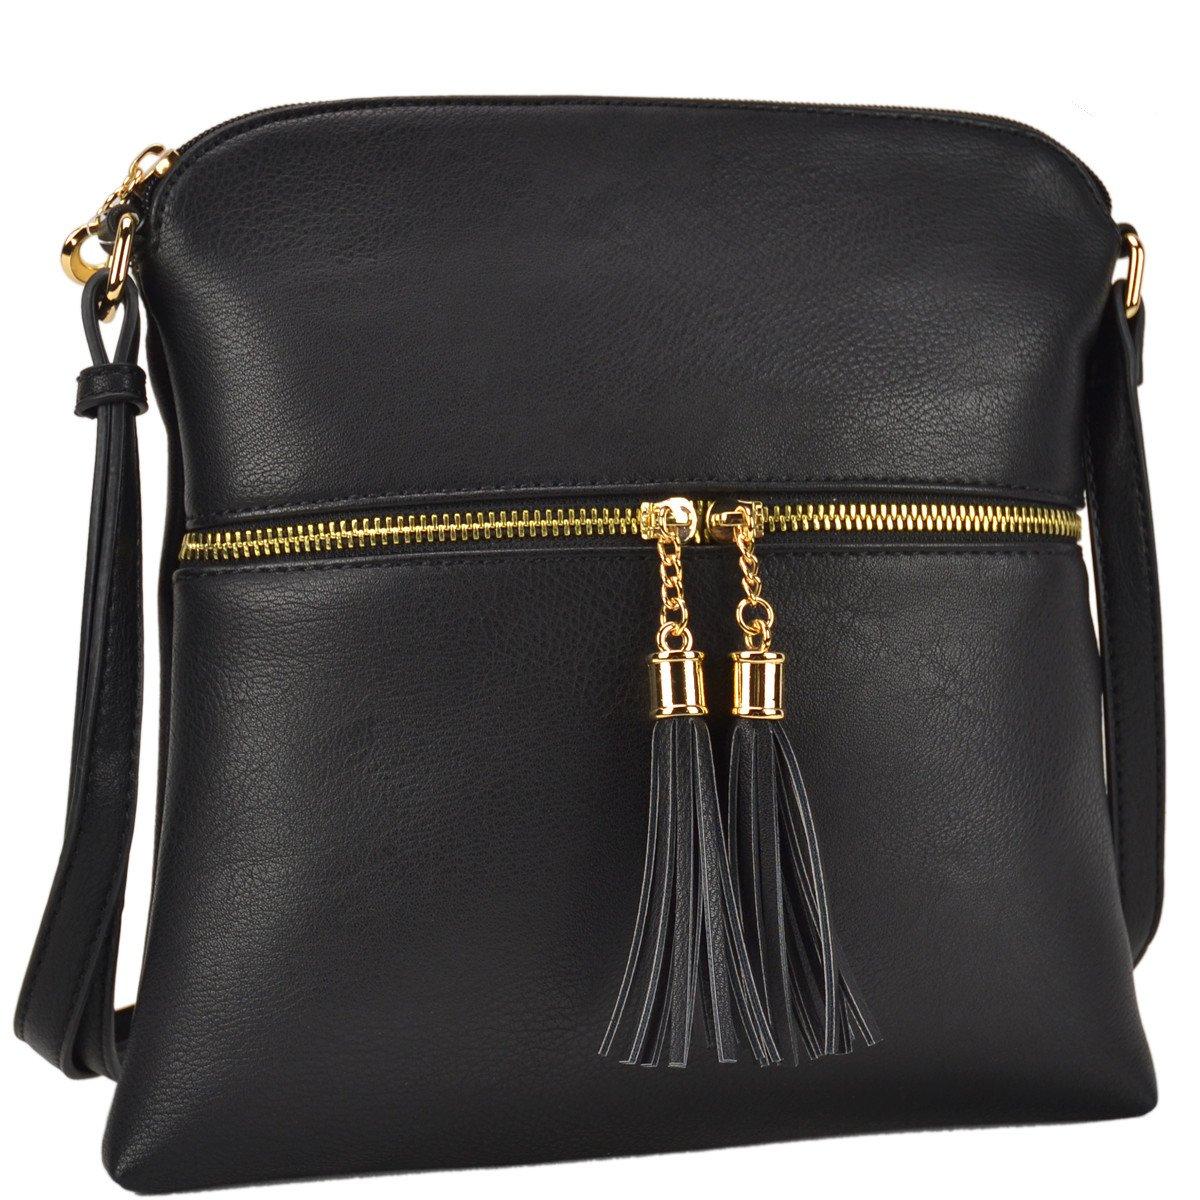 Dasein Lightweight Medium Crossbody Bag Vegan Leather Shoulder Bag Small Travel Purse with Tassel